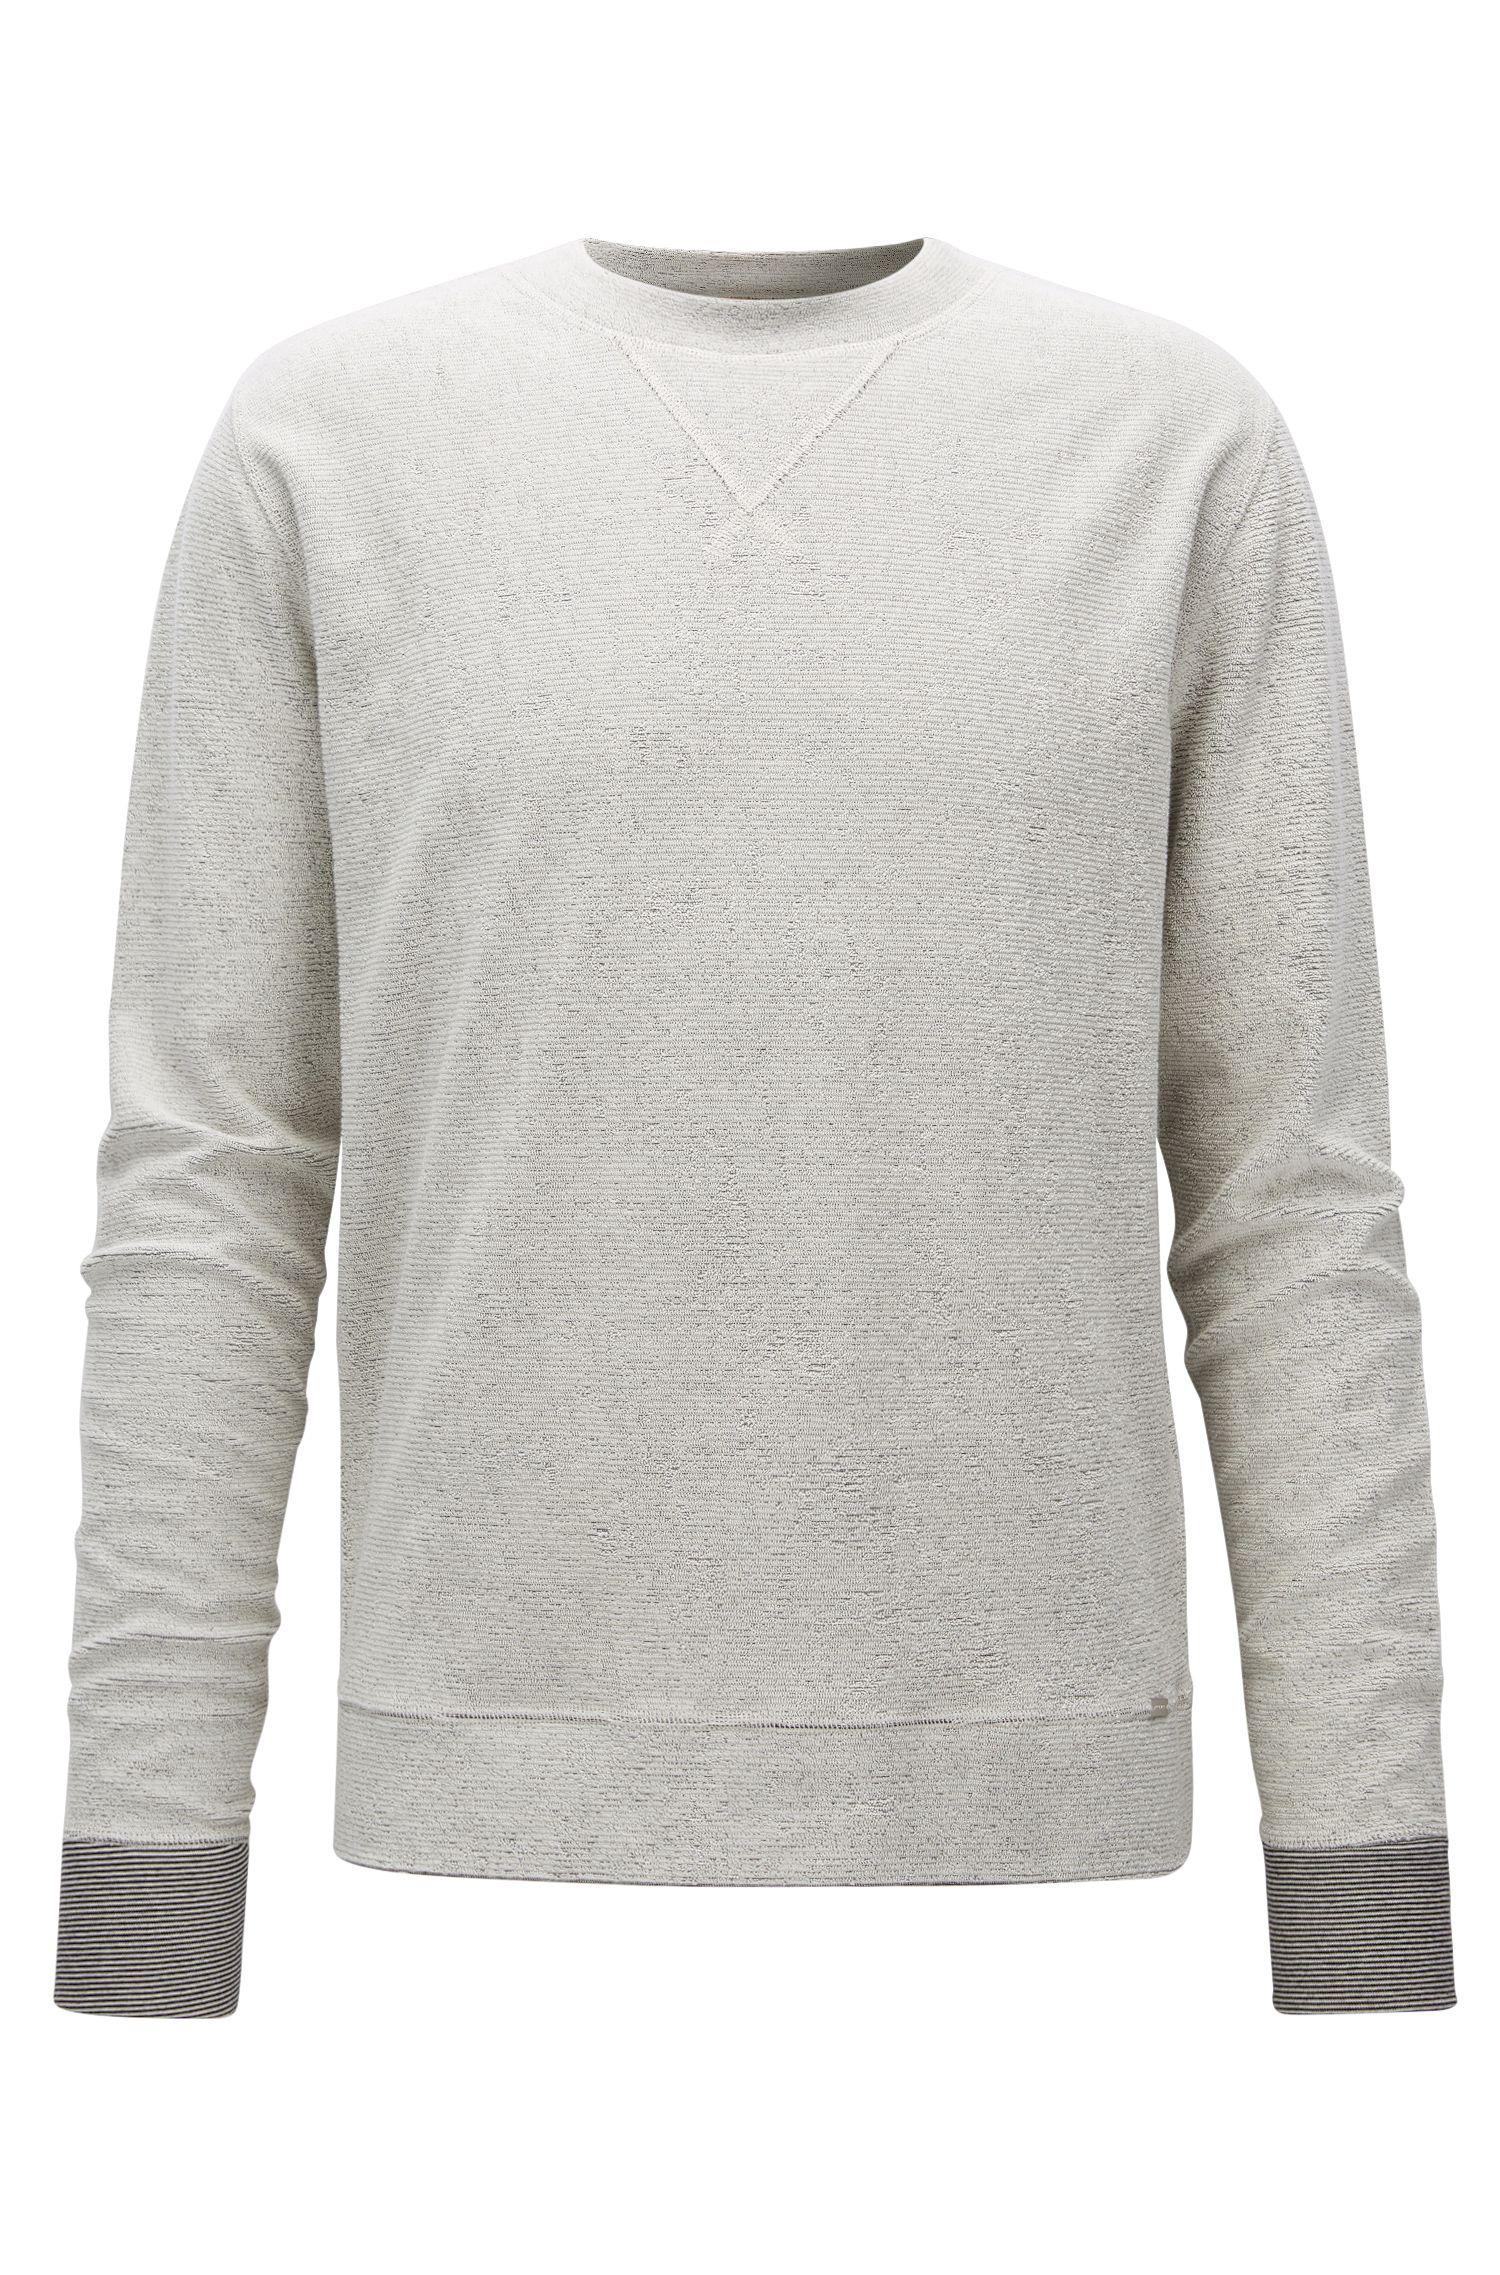 Relaxed-Fit Wendesweatshirt aus Baumwolle